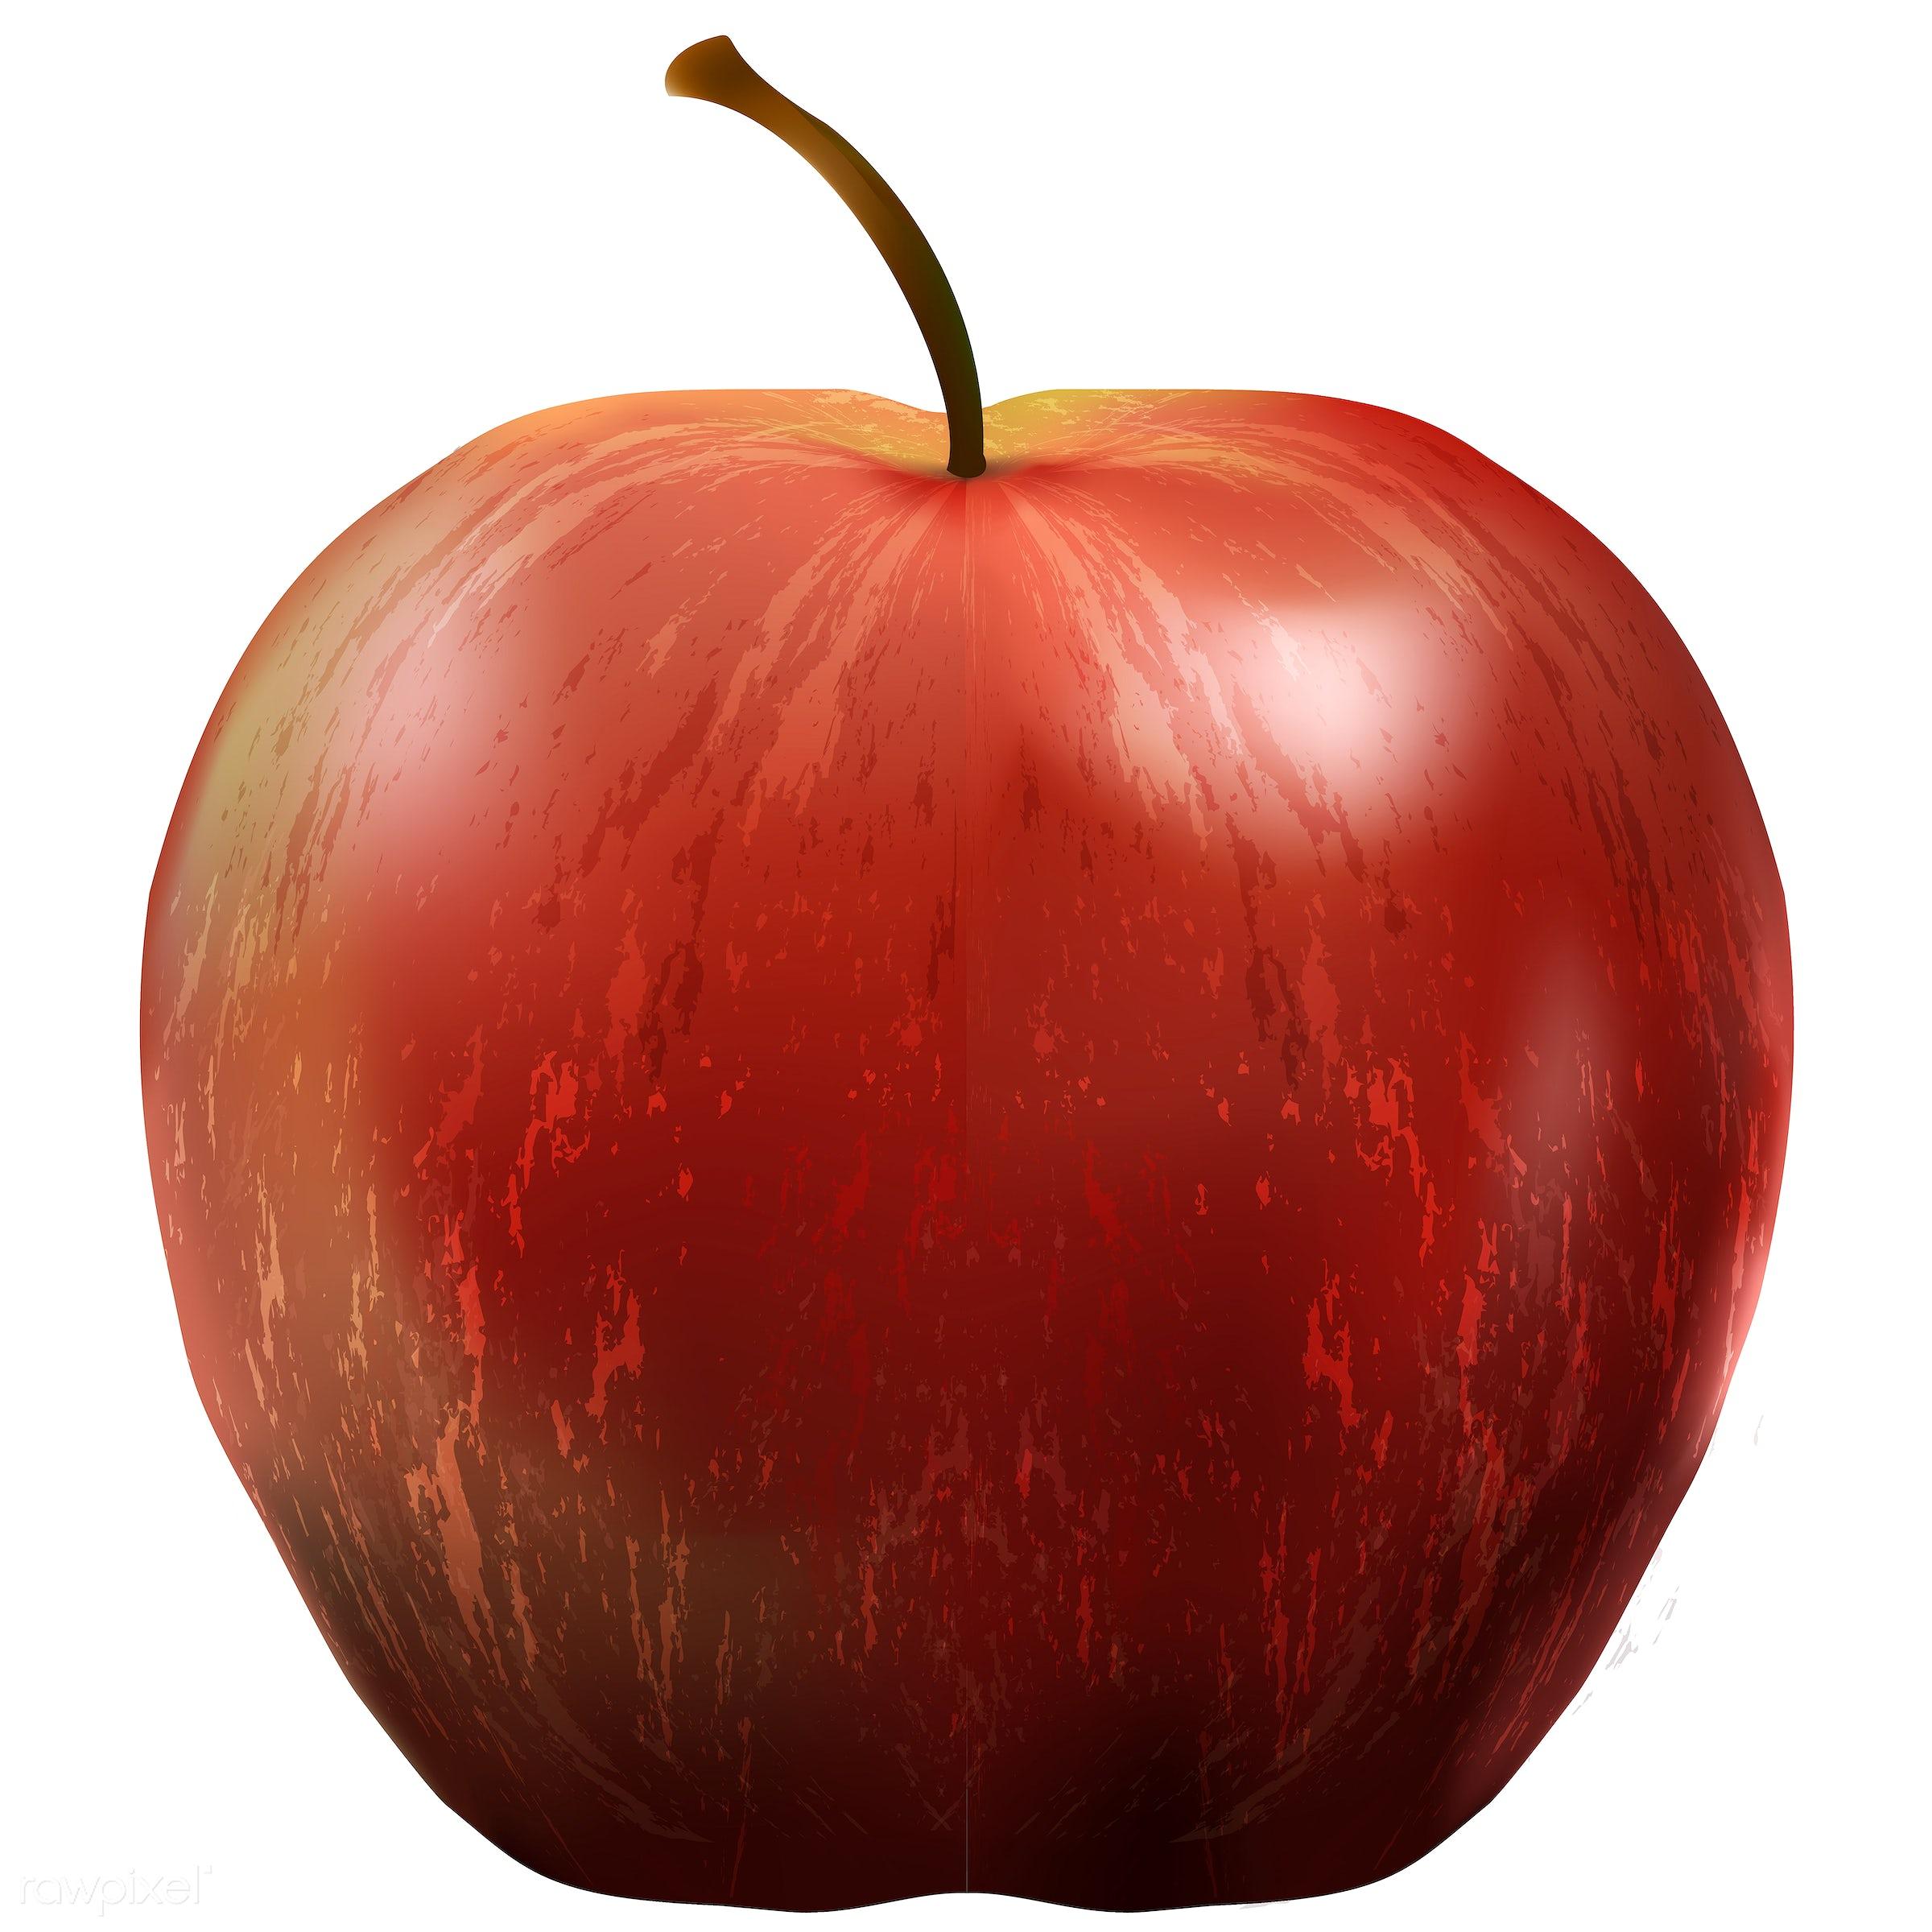 Illustration of grapes isolated on white background - apple, fruit, autumn, celebration, crops, elements, fall, festival,...